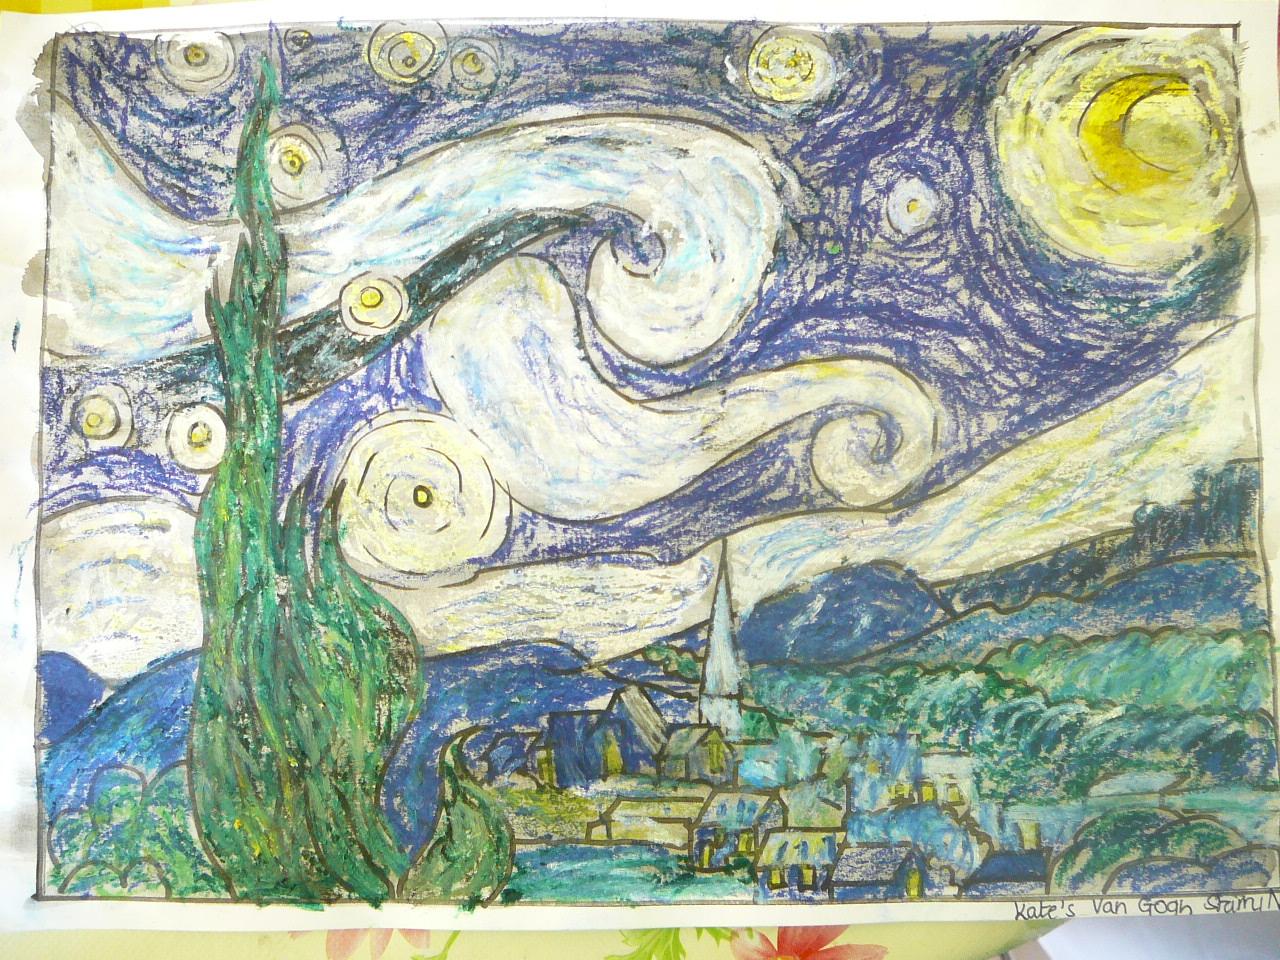 Free coloring pages van gogh - Free Coloring Pages Van Gogh Starry Night Coloring Page Van Gogh S Starry Nig